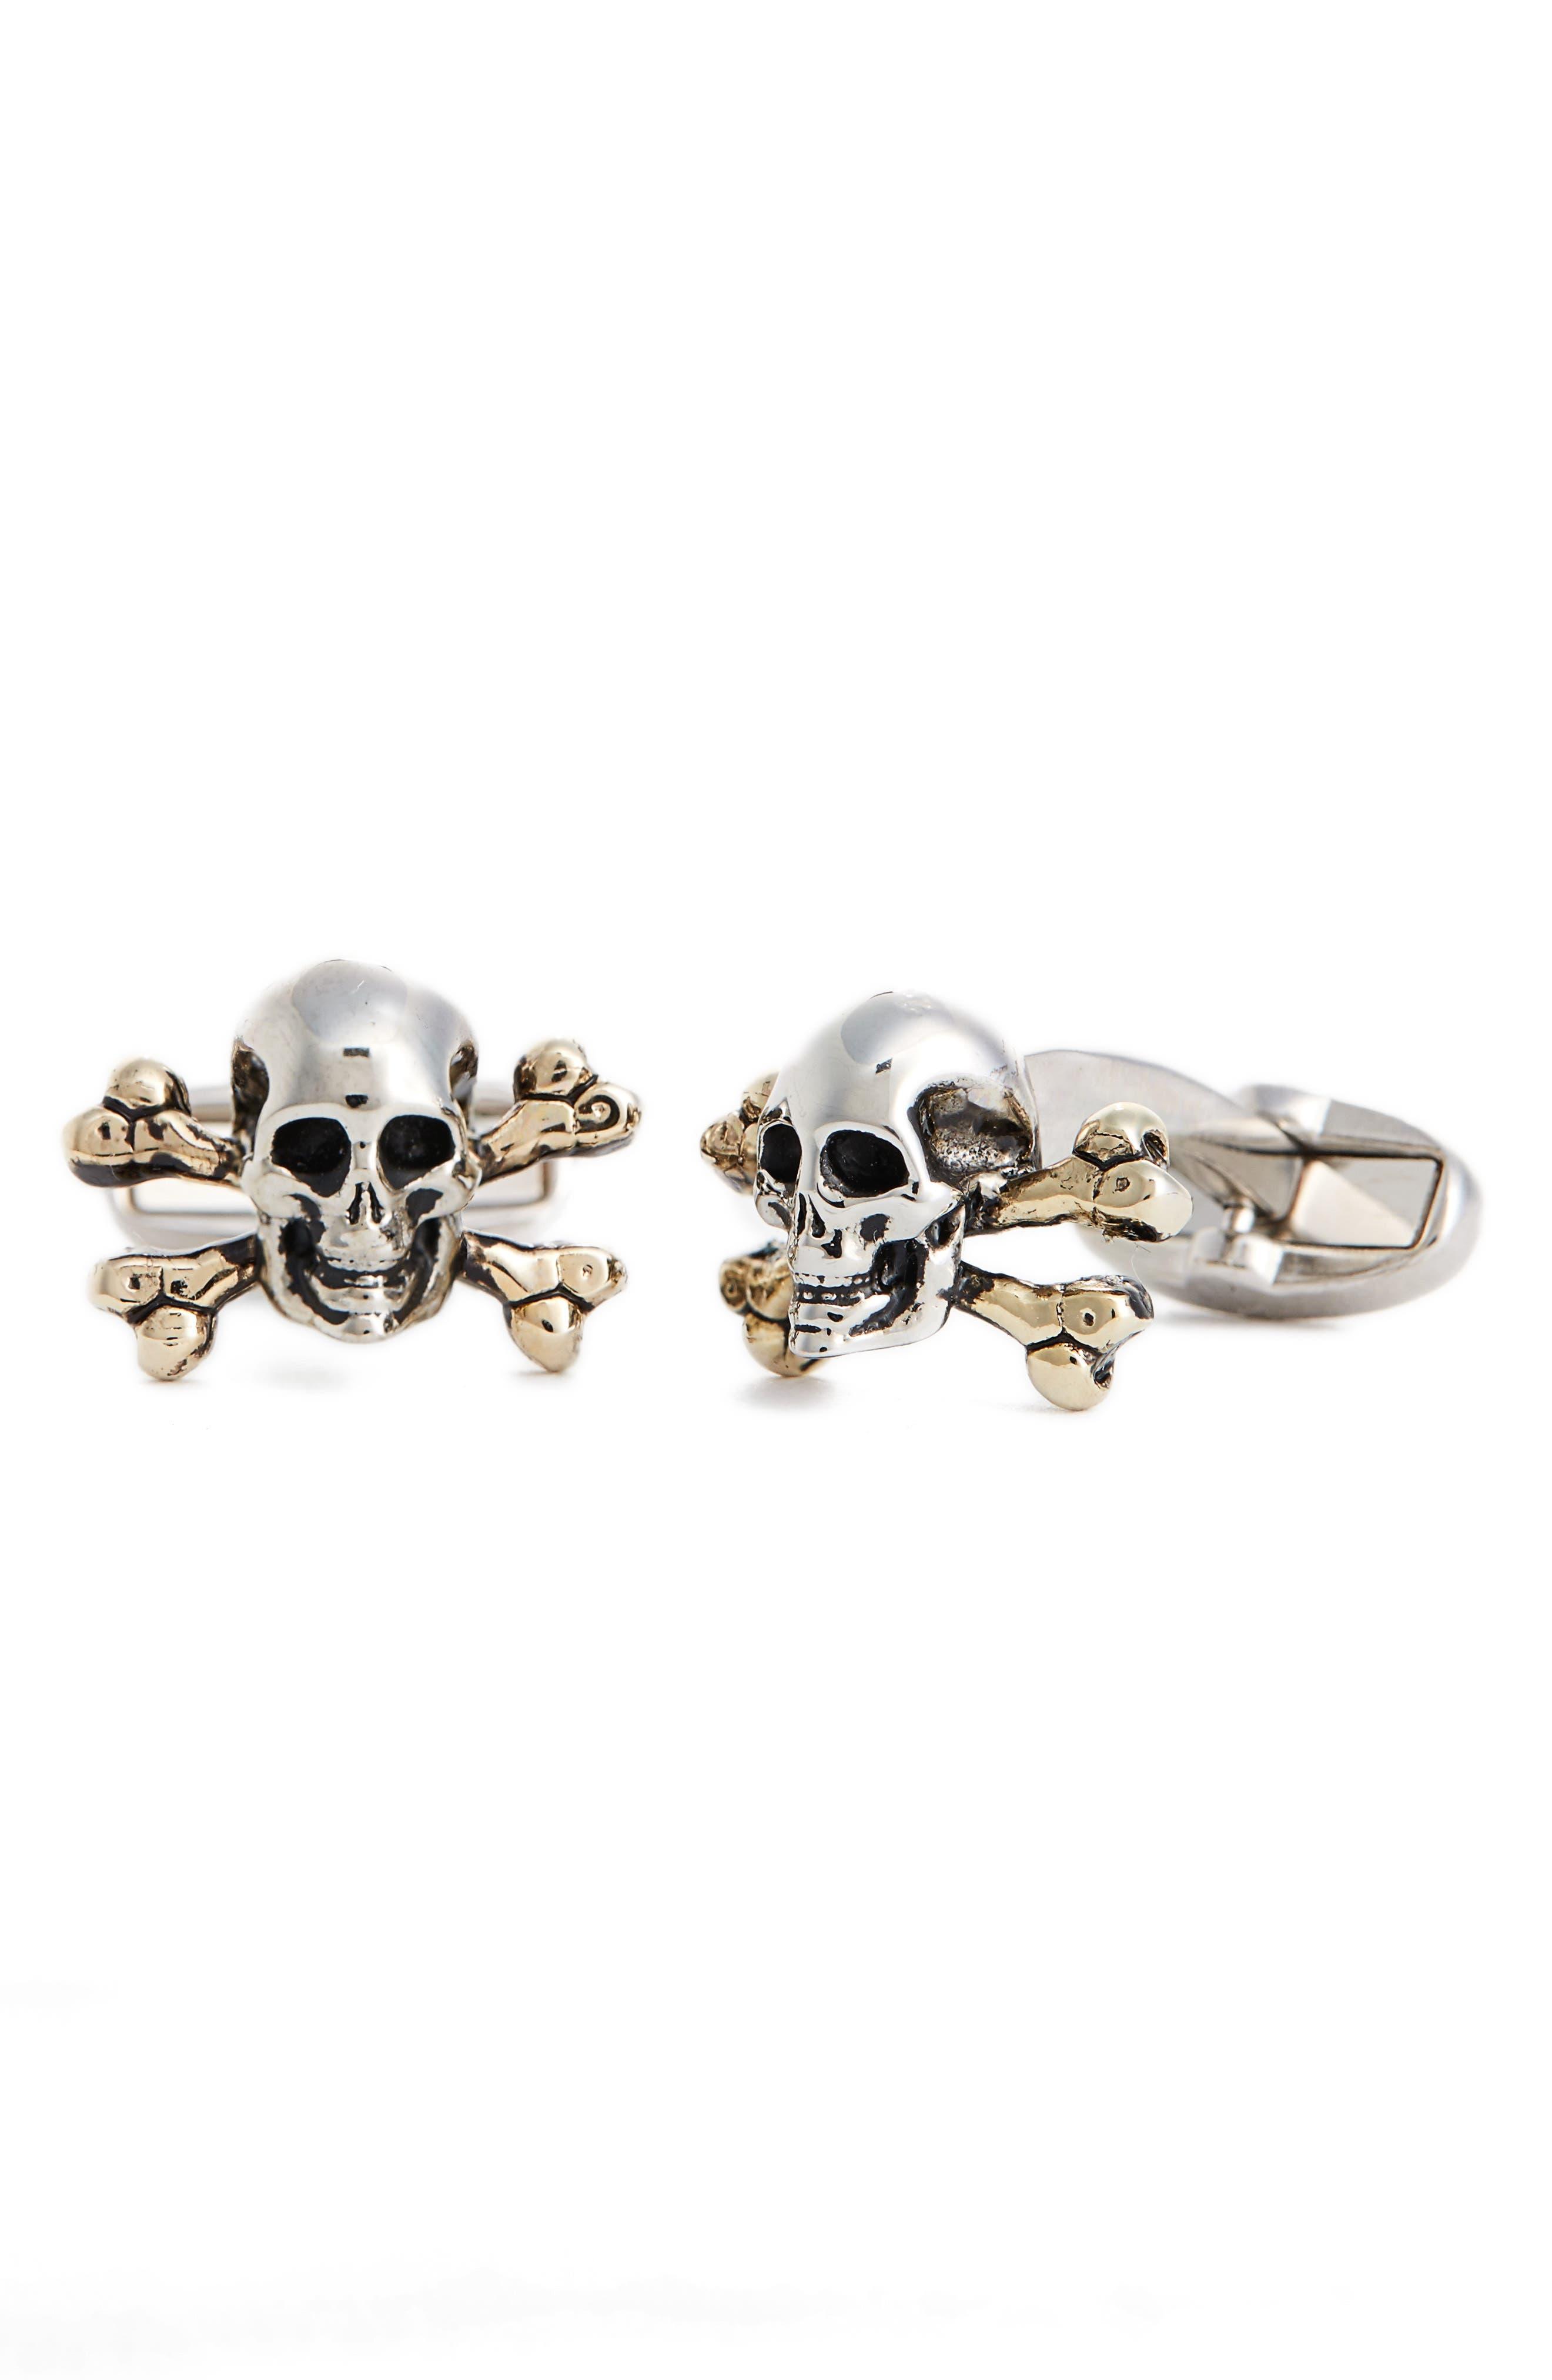 Skull & Crossbones Cuff Links,                         Main,                         color, Metallic Silver